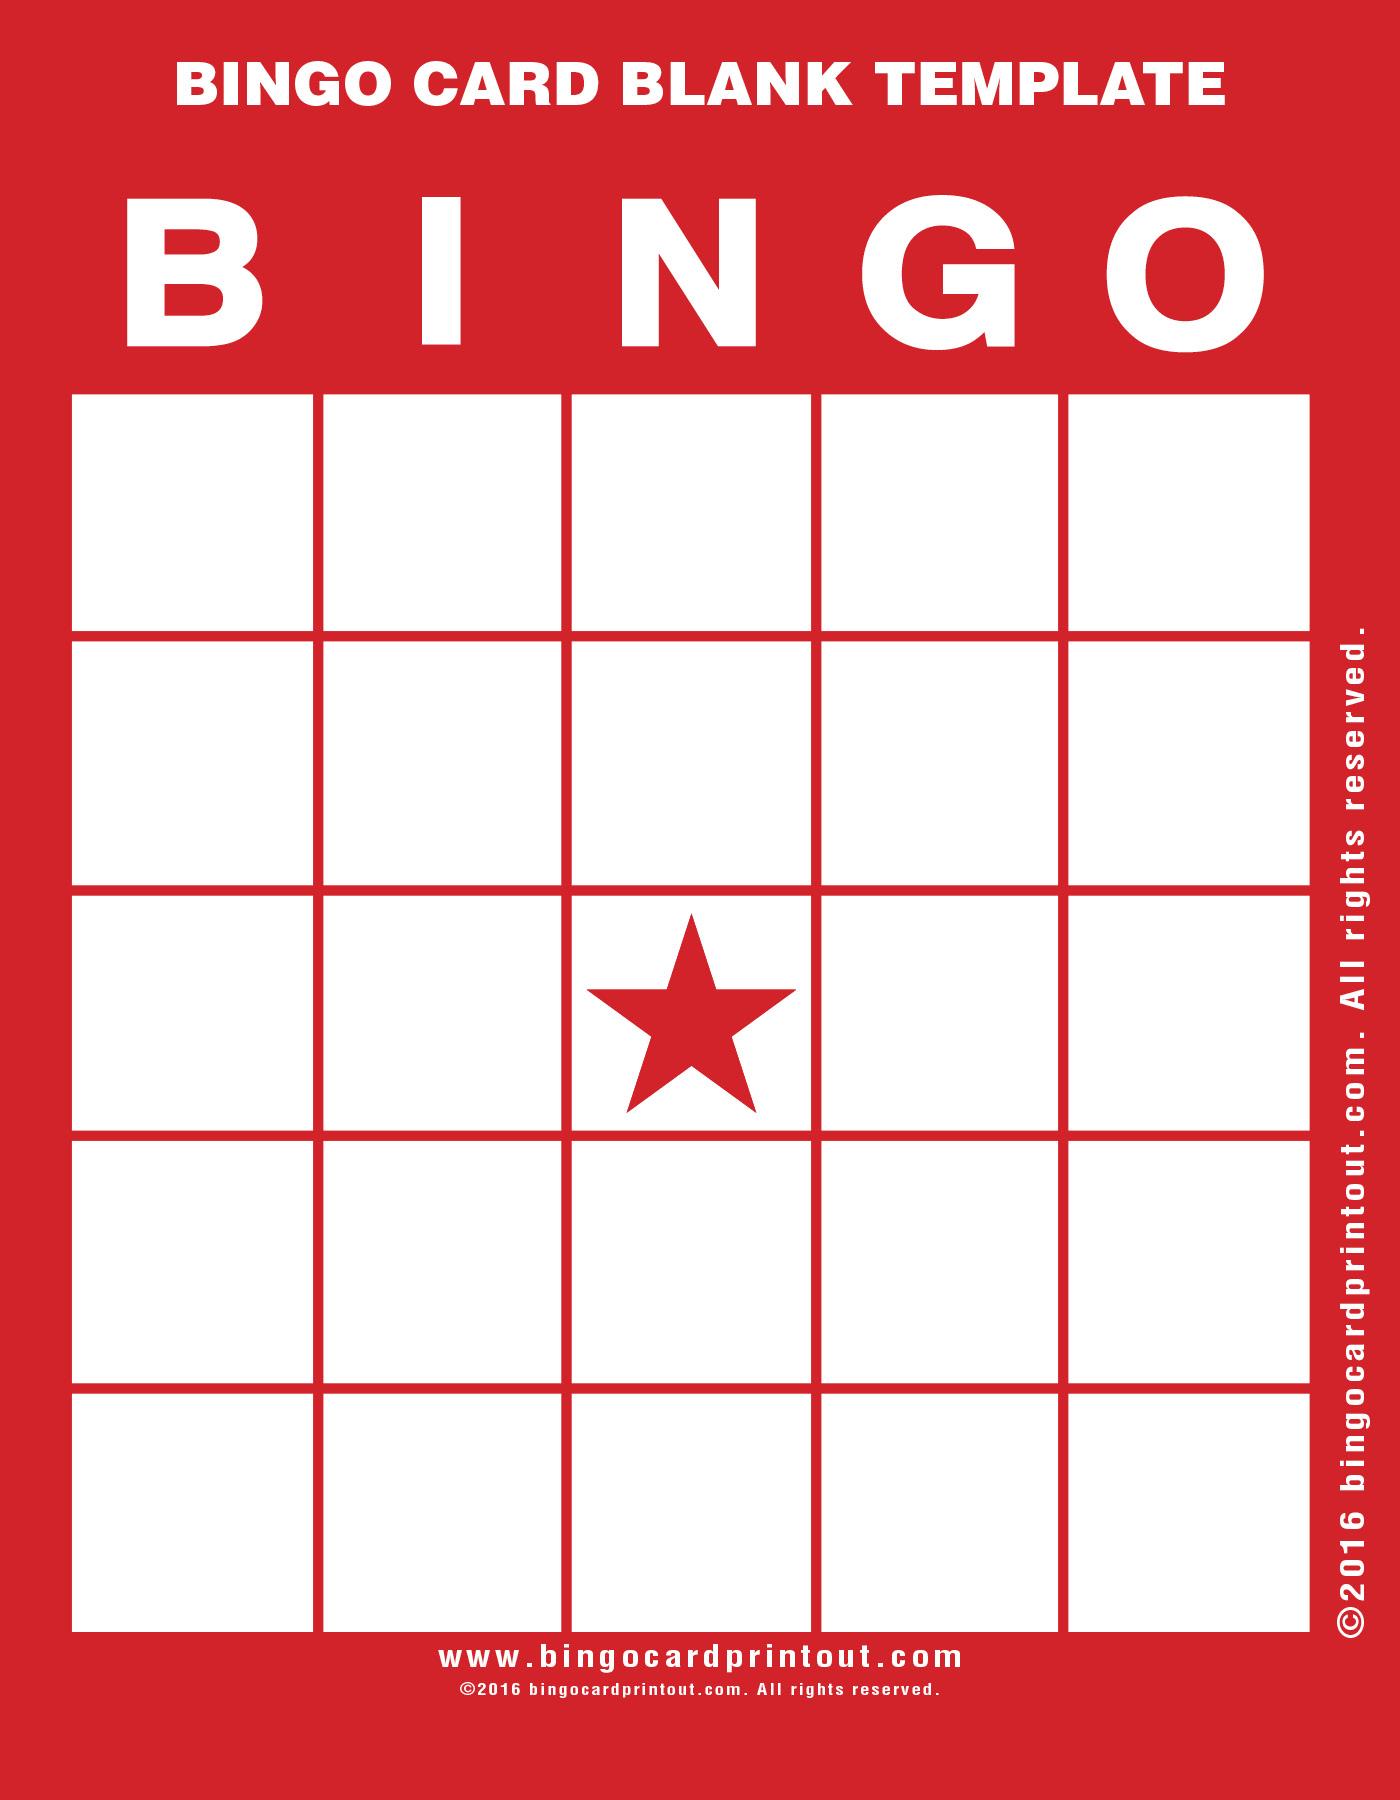 Bingo Card Blank Template Bingocardprintout Com